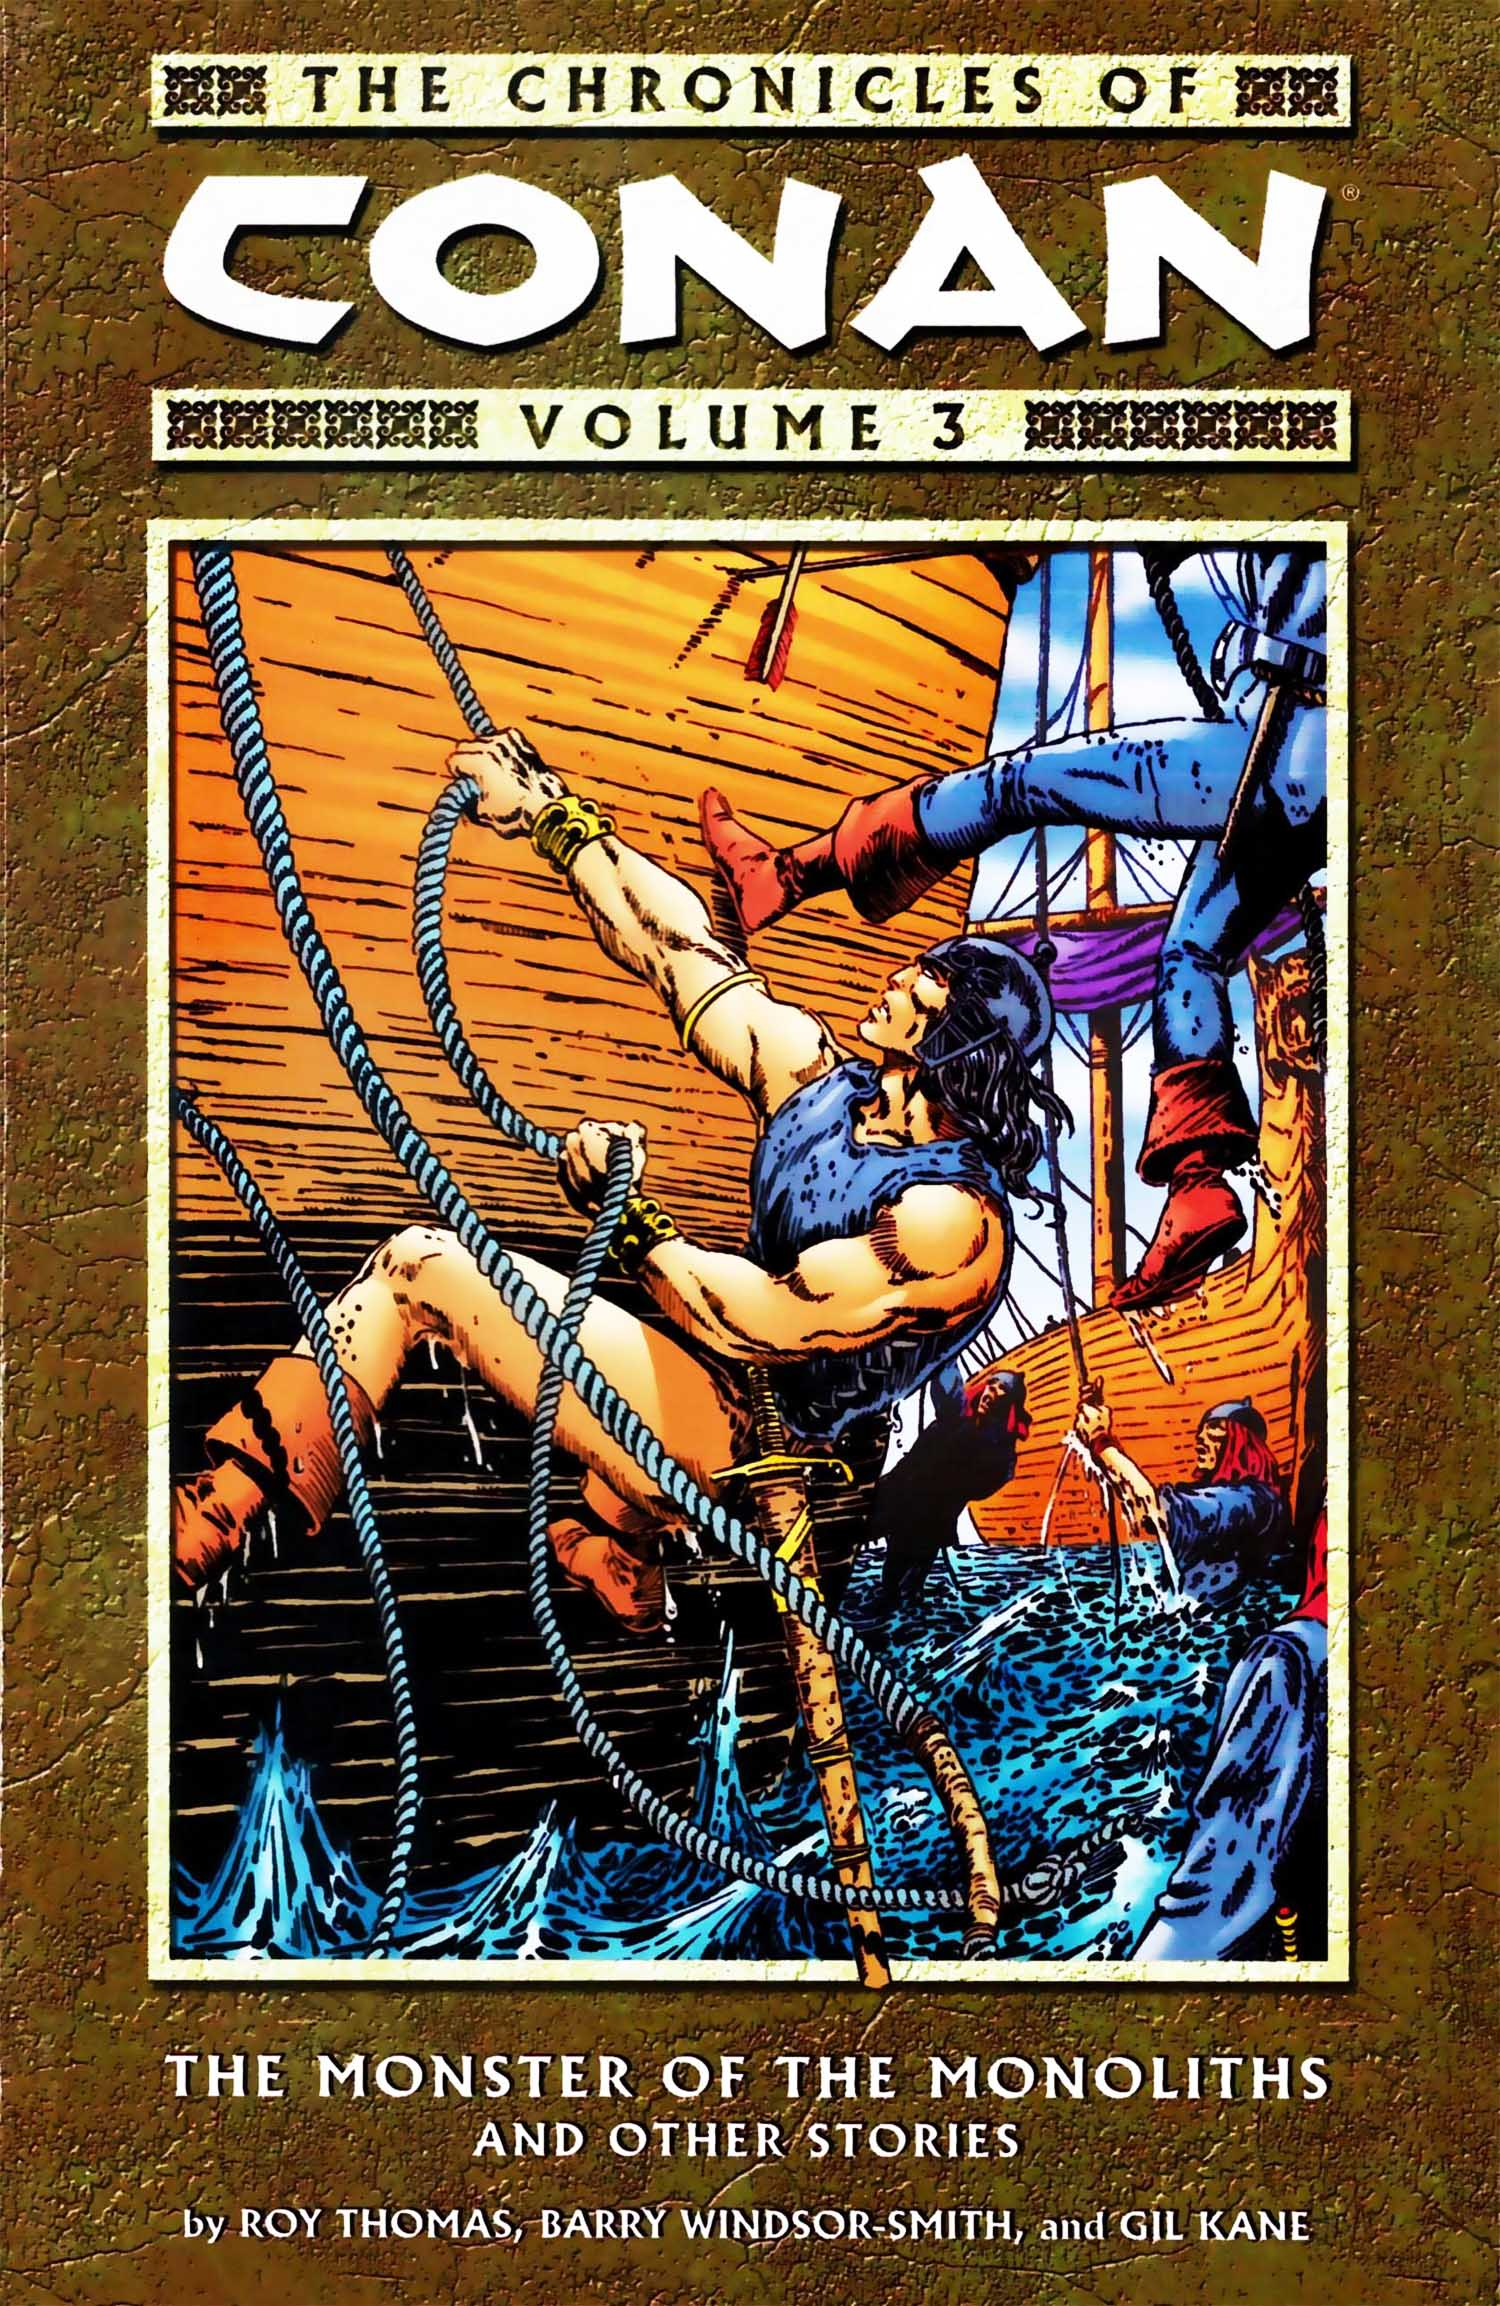 The Chronicles of Conan Volume 3